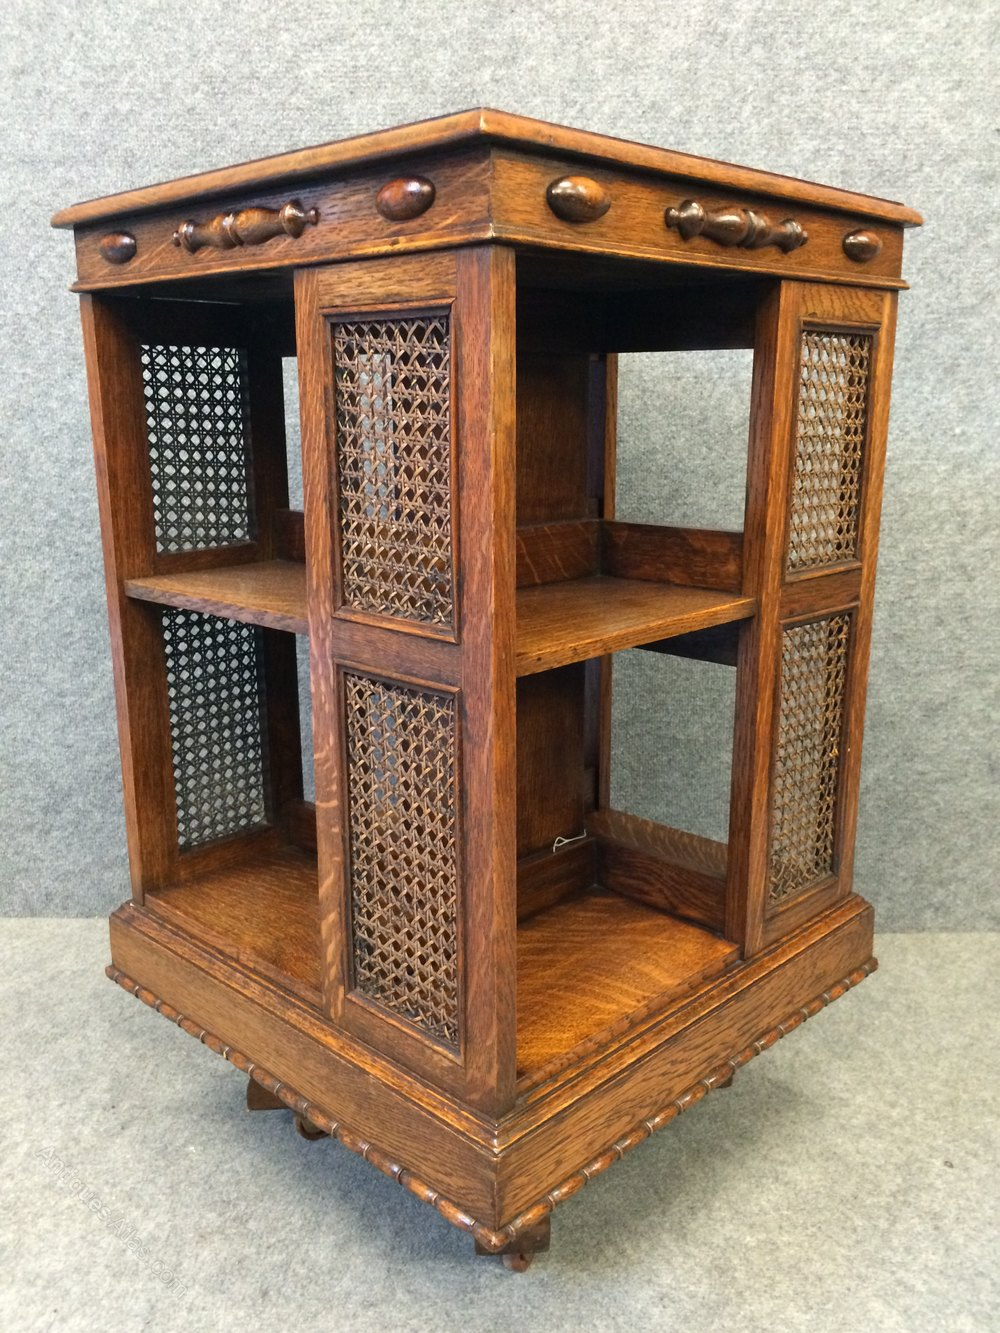 Unusual Edwardian Revolving Bookcase Antiques Atlas